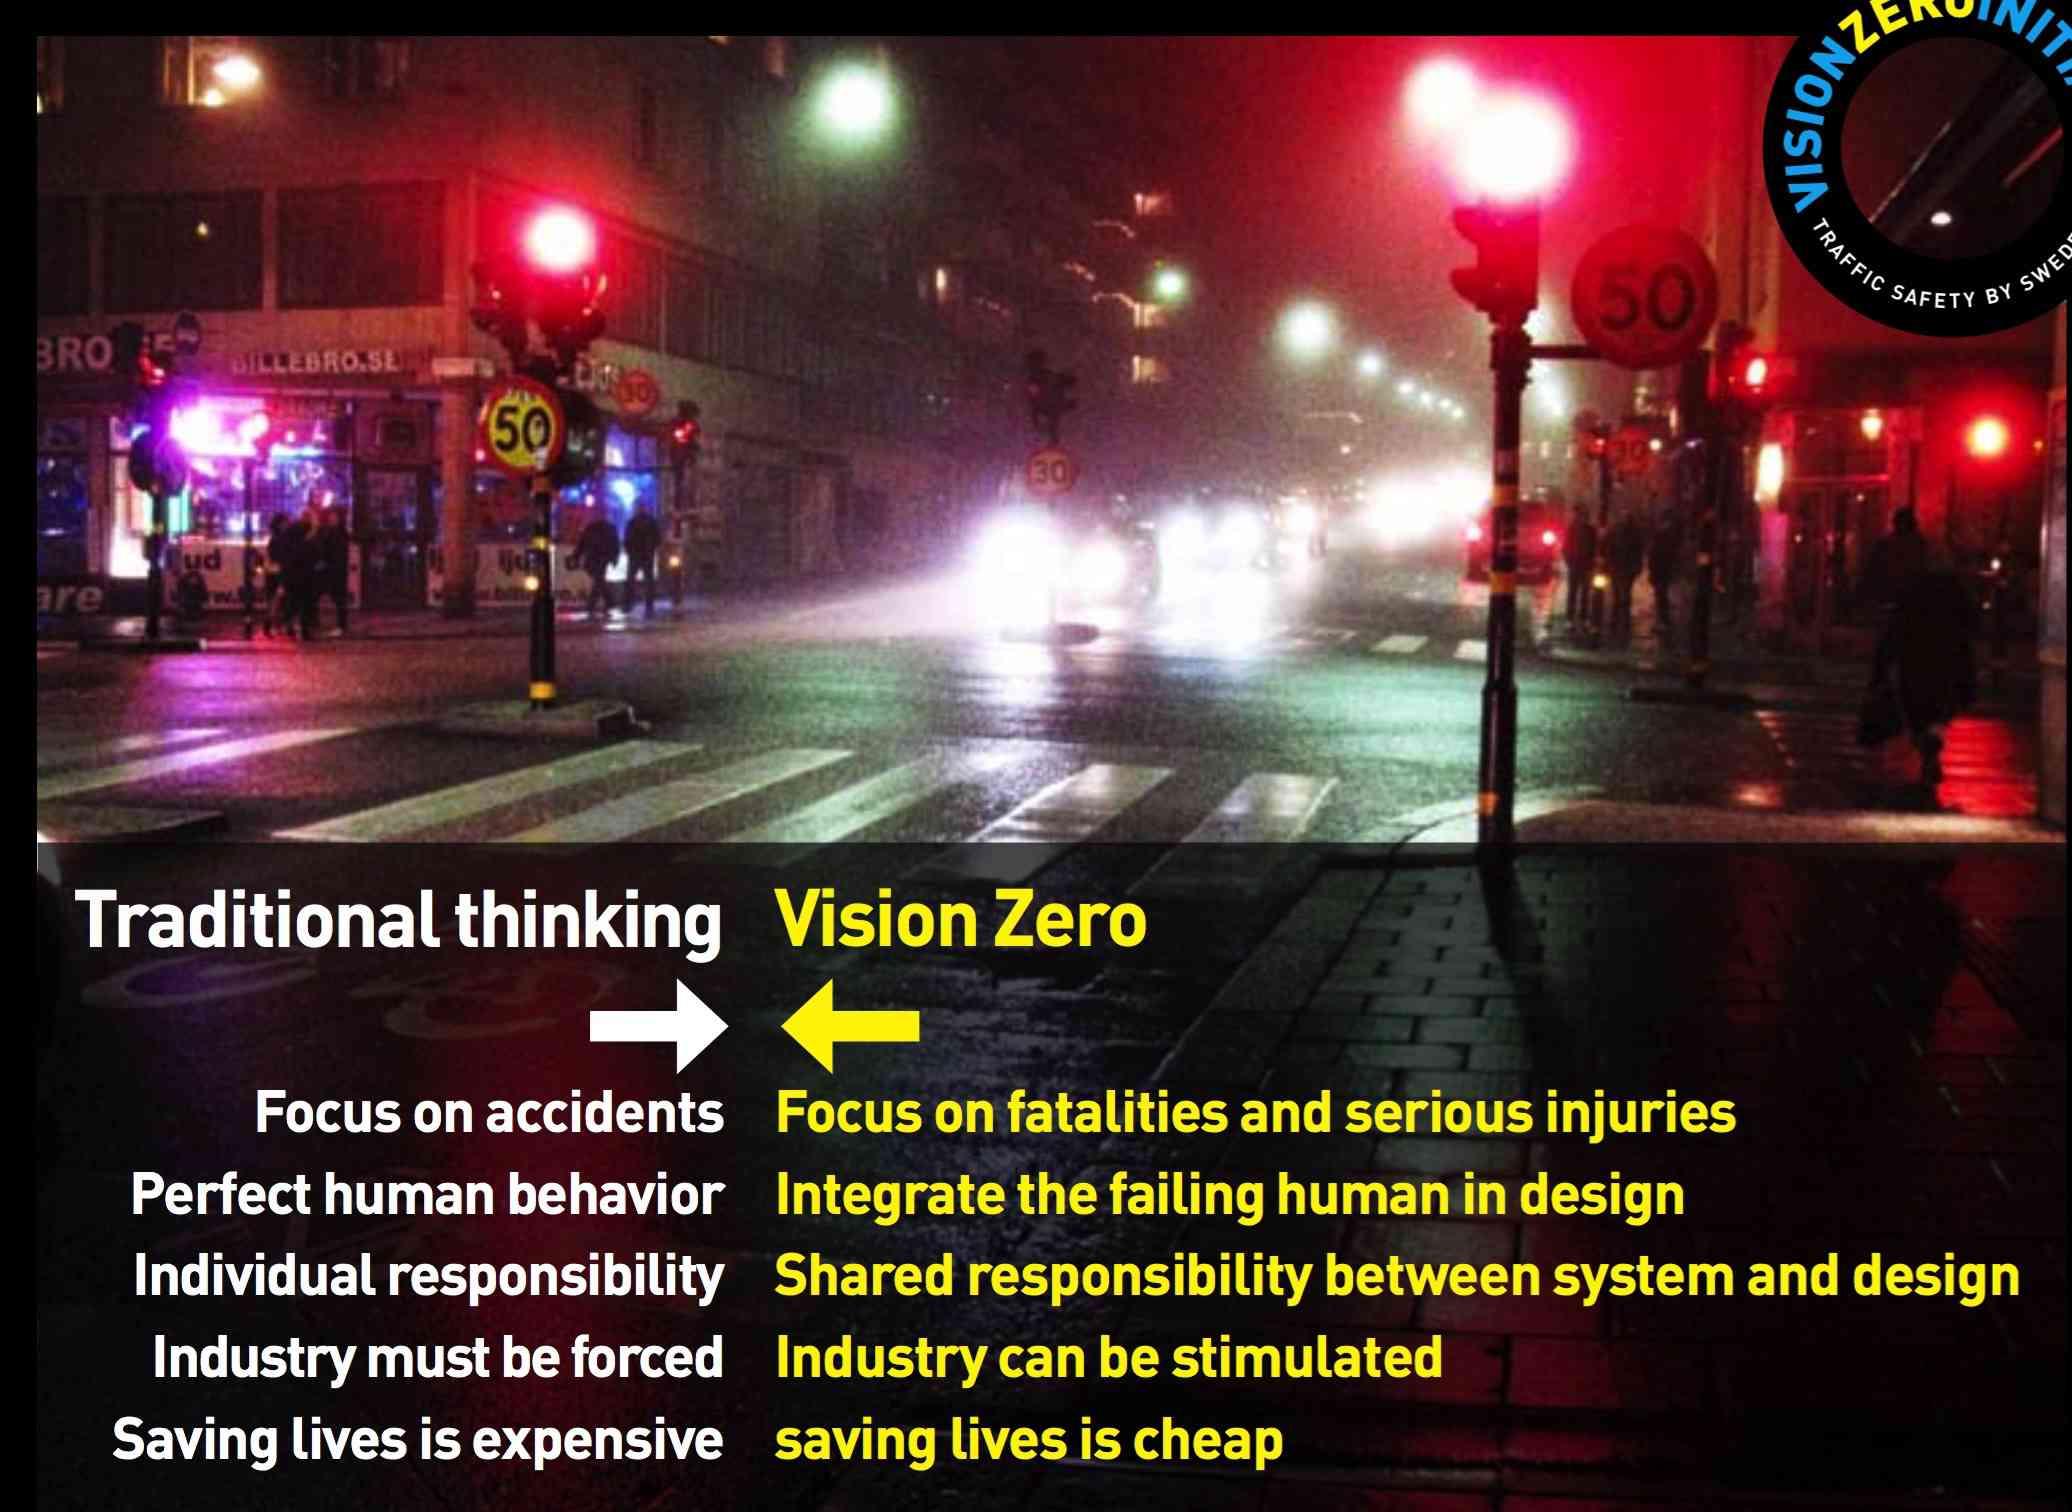 Vision Zero thinking